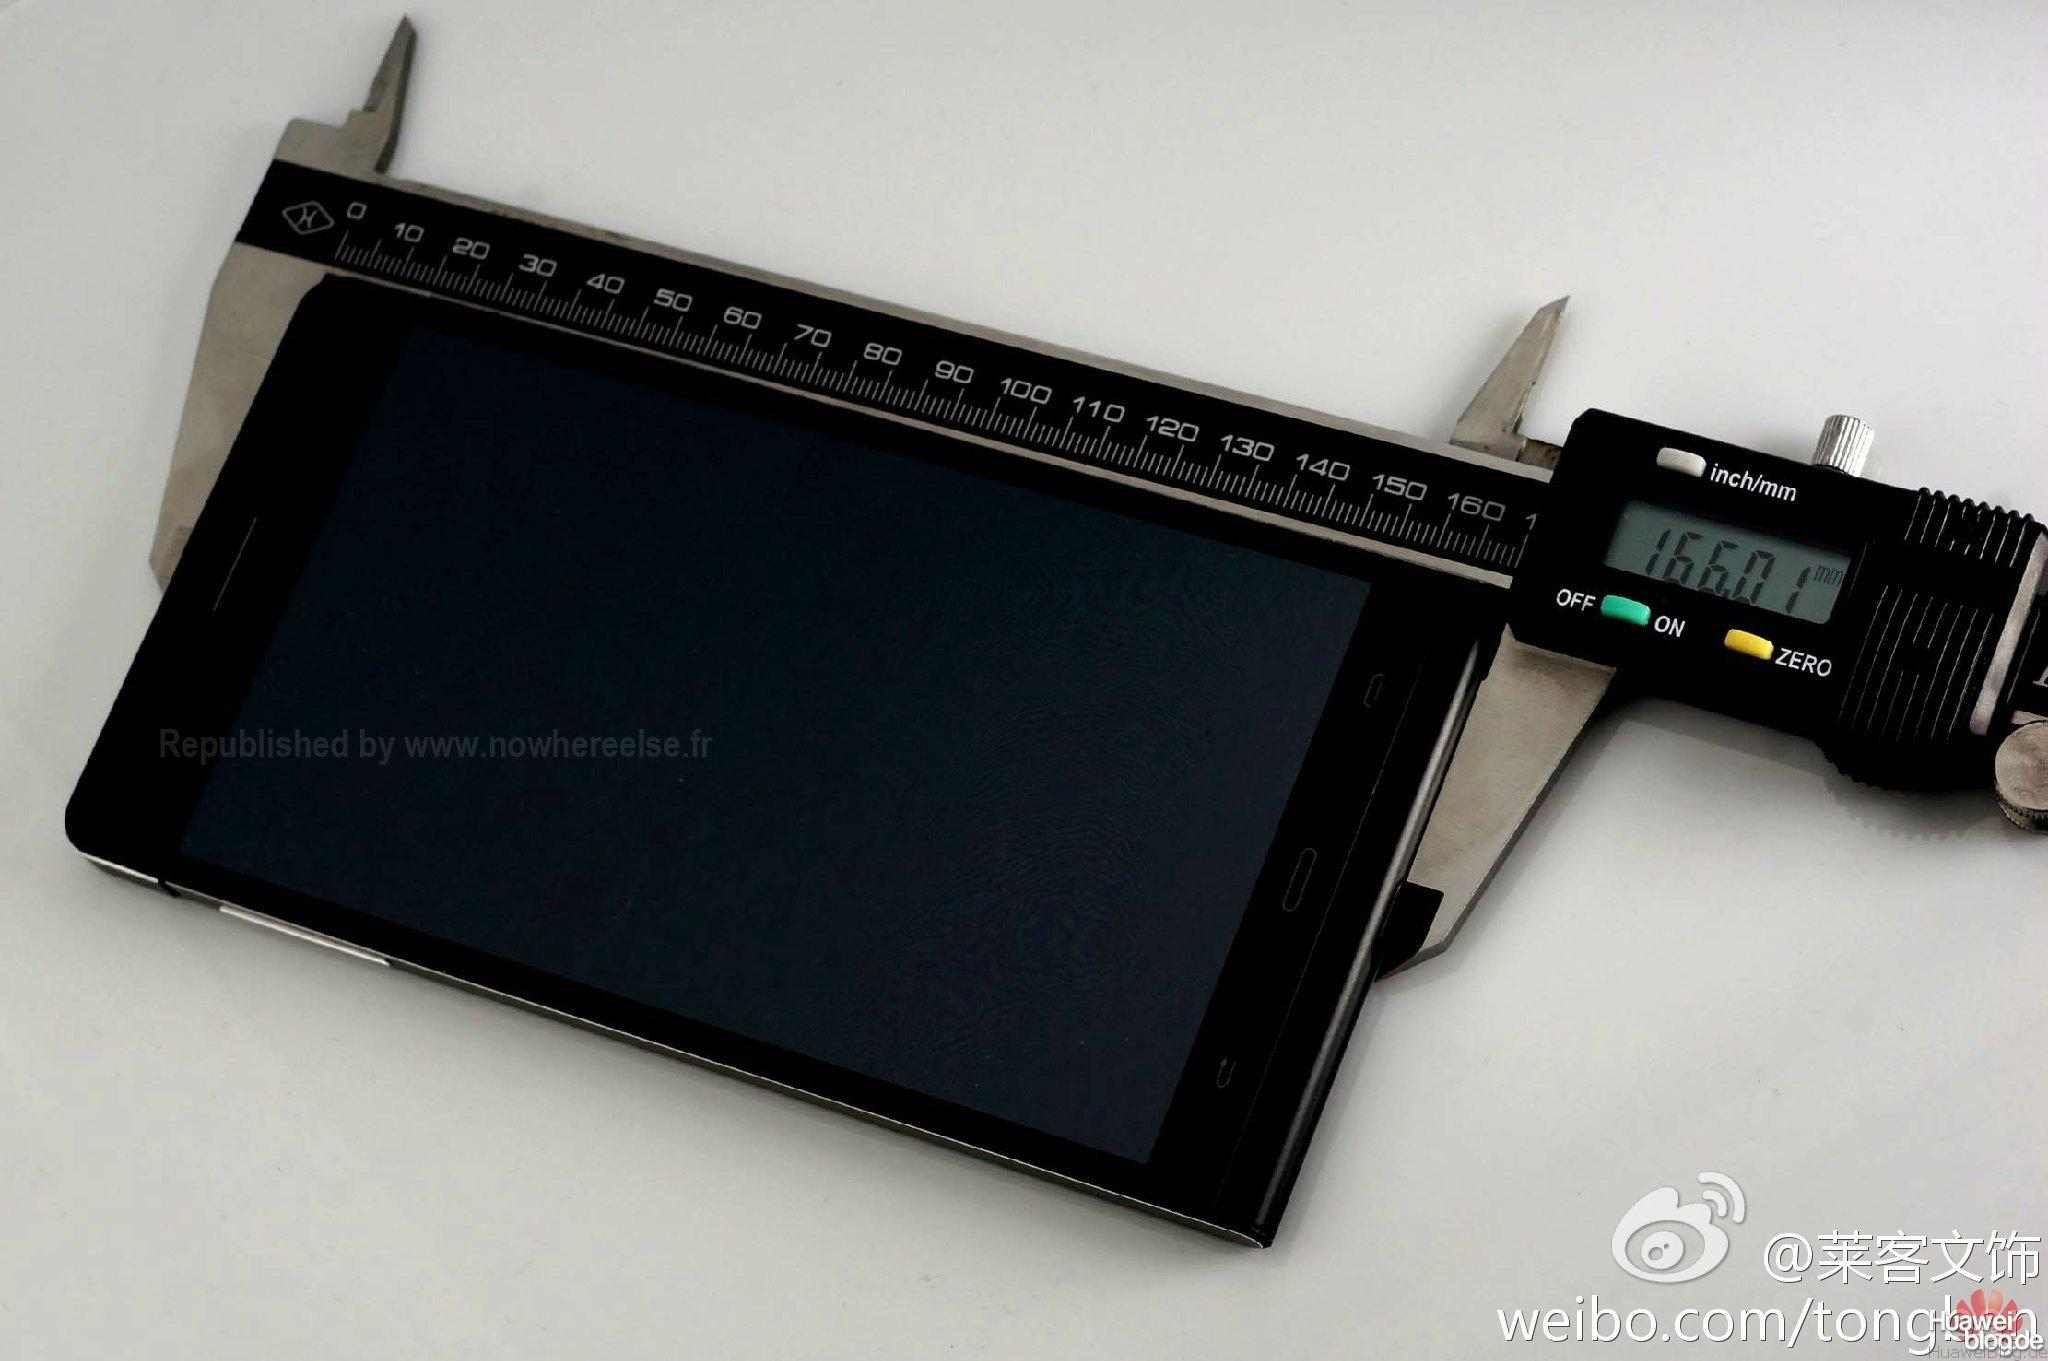 Huawei Ascend P6S Länge